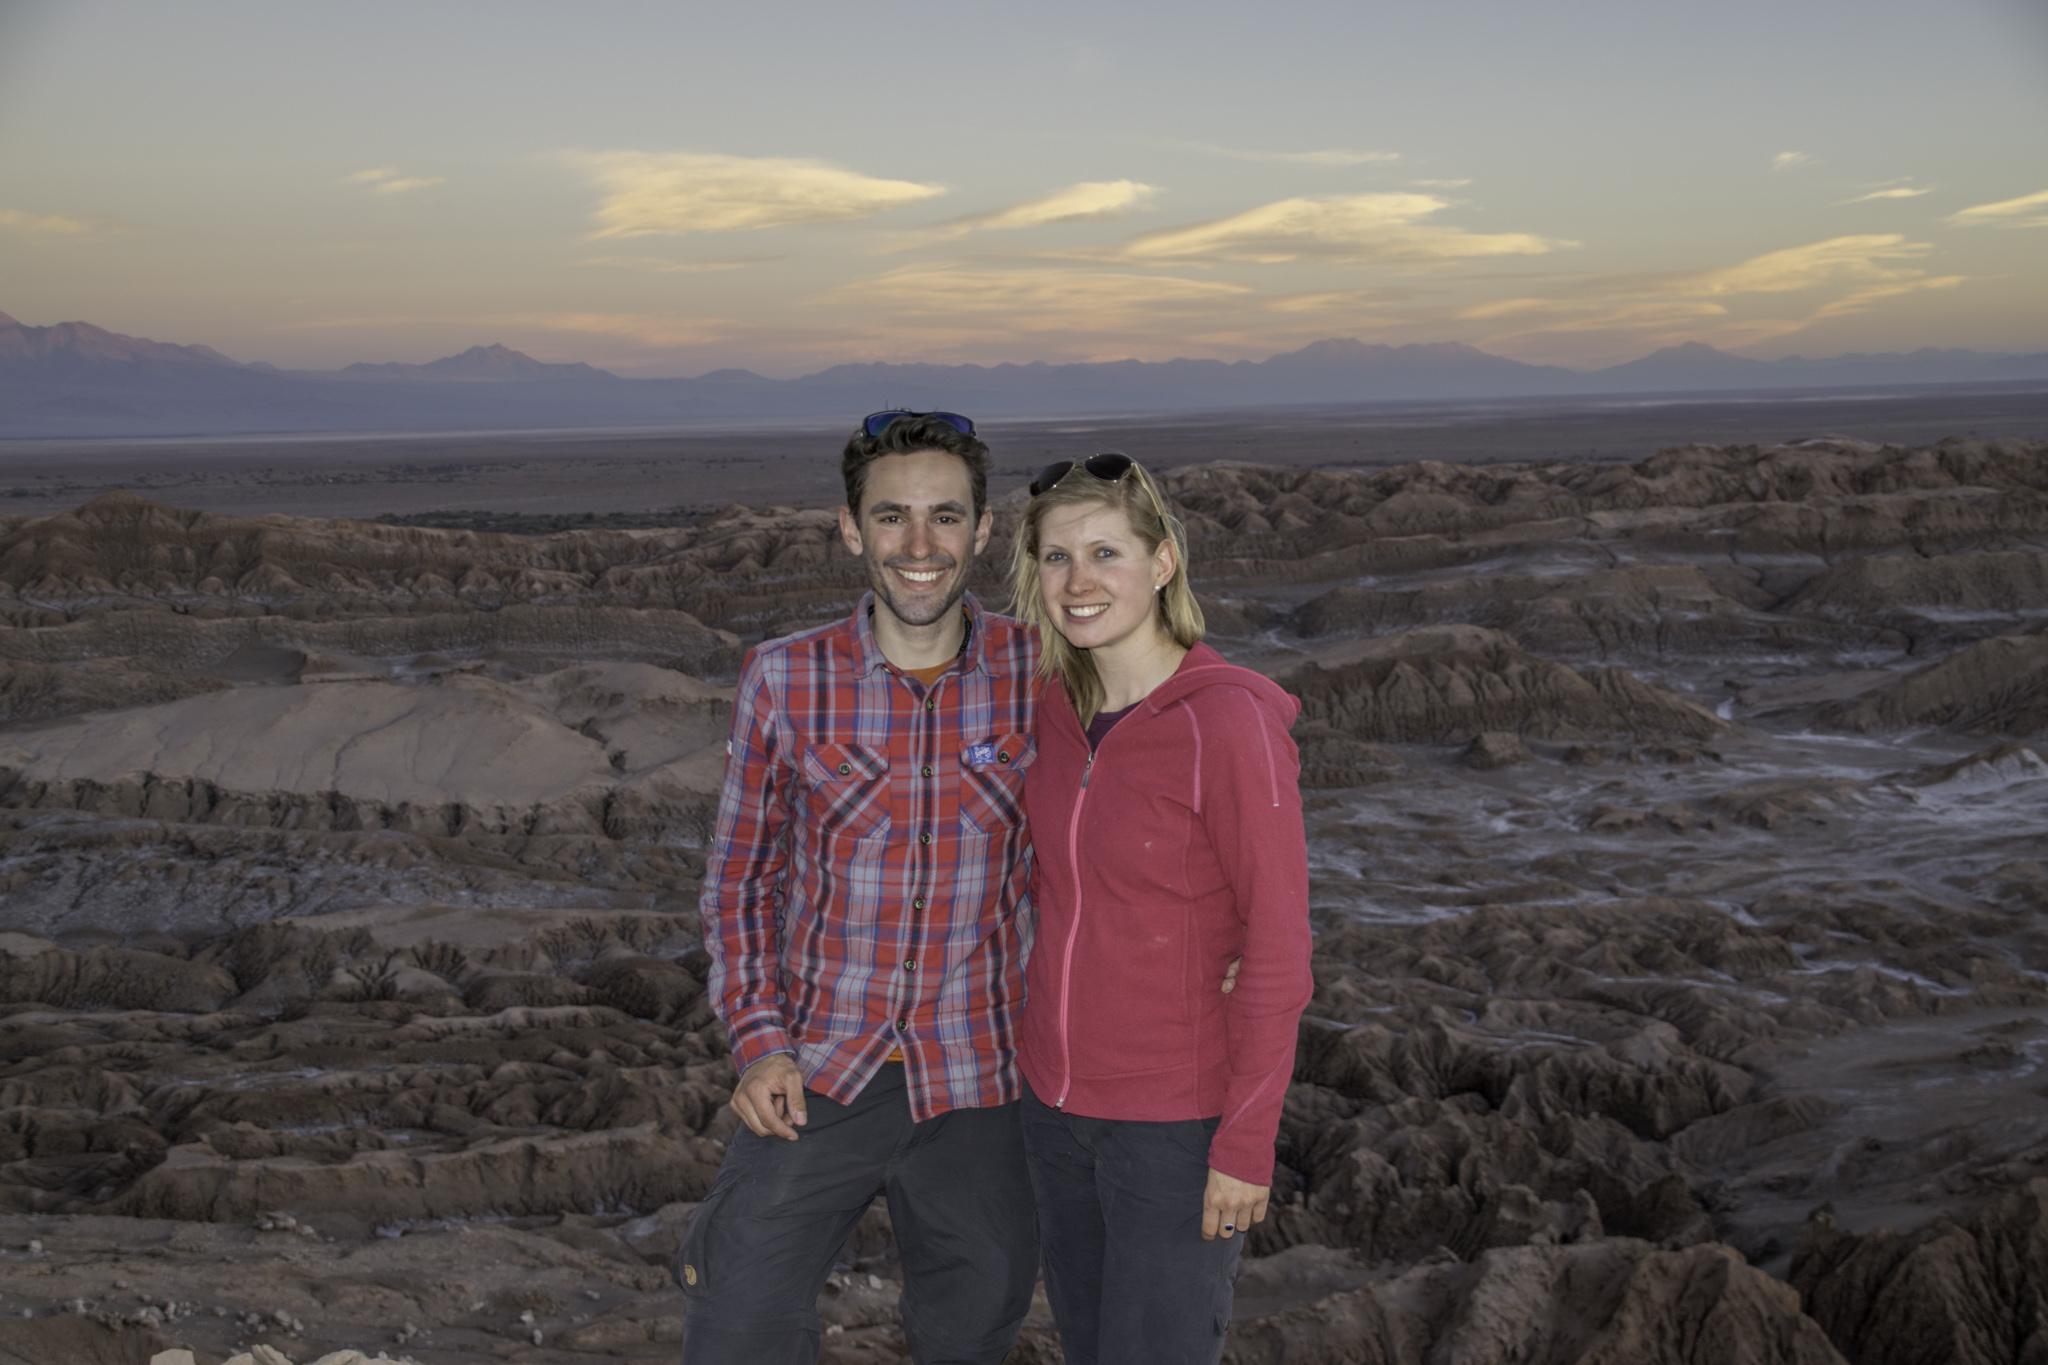 Sonnenuntergang auf dem Kojote-Felsen